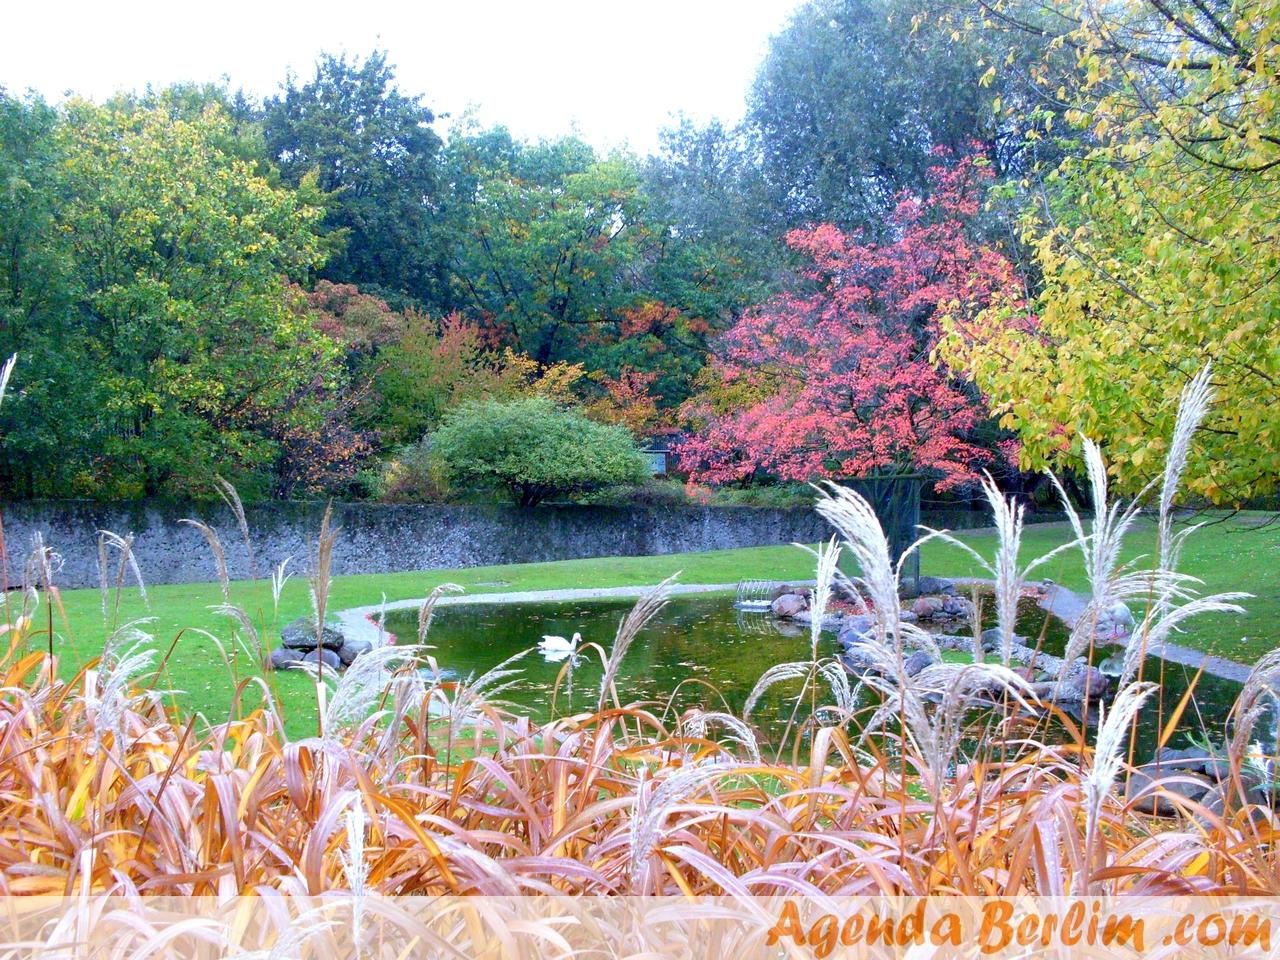 Outono chegado no Zoo de Berlim